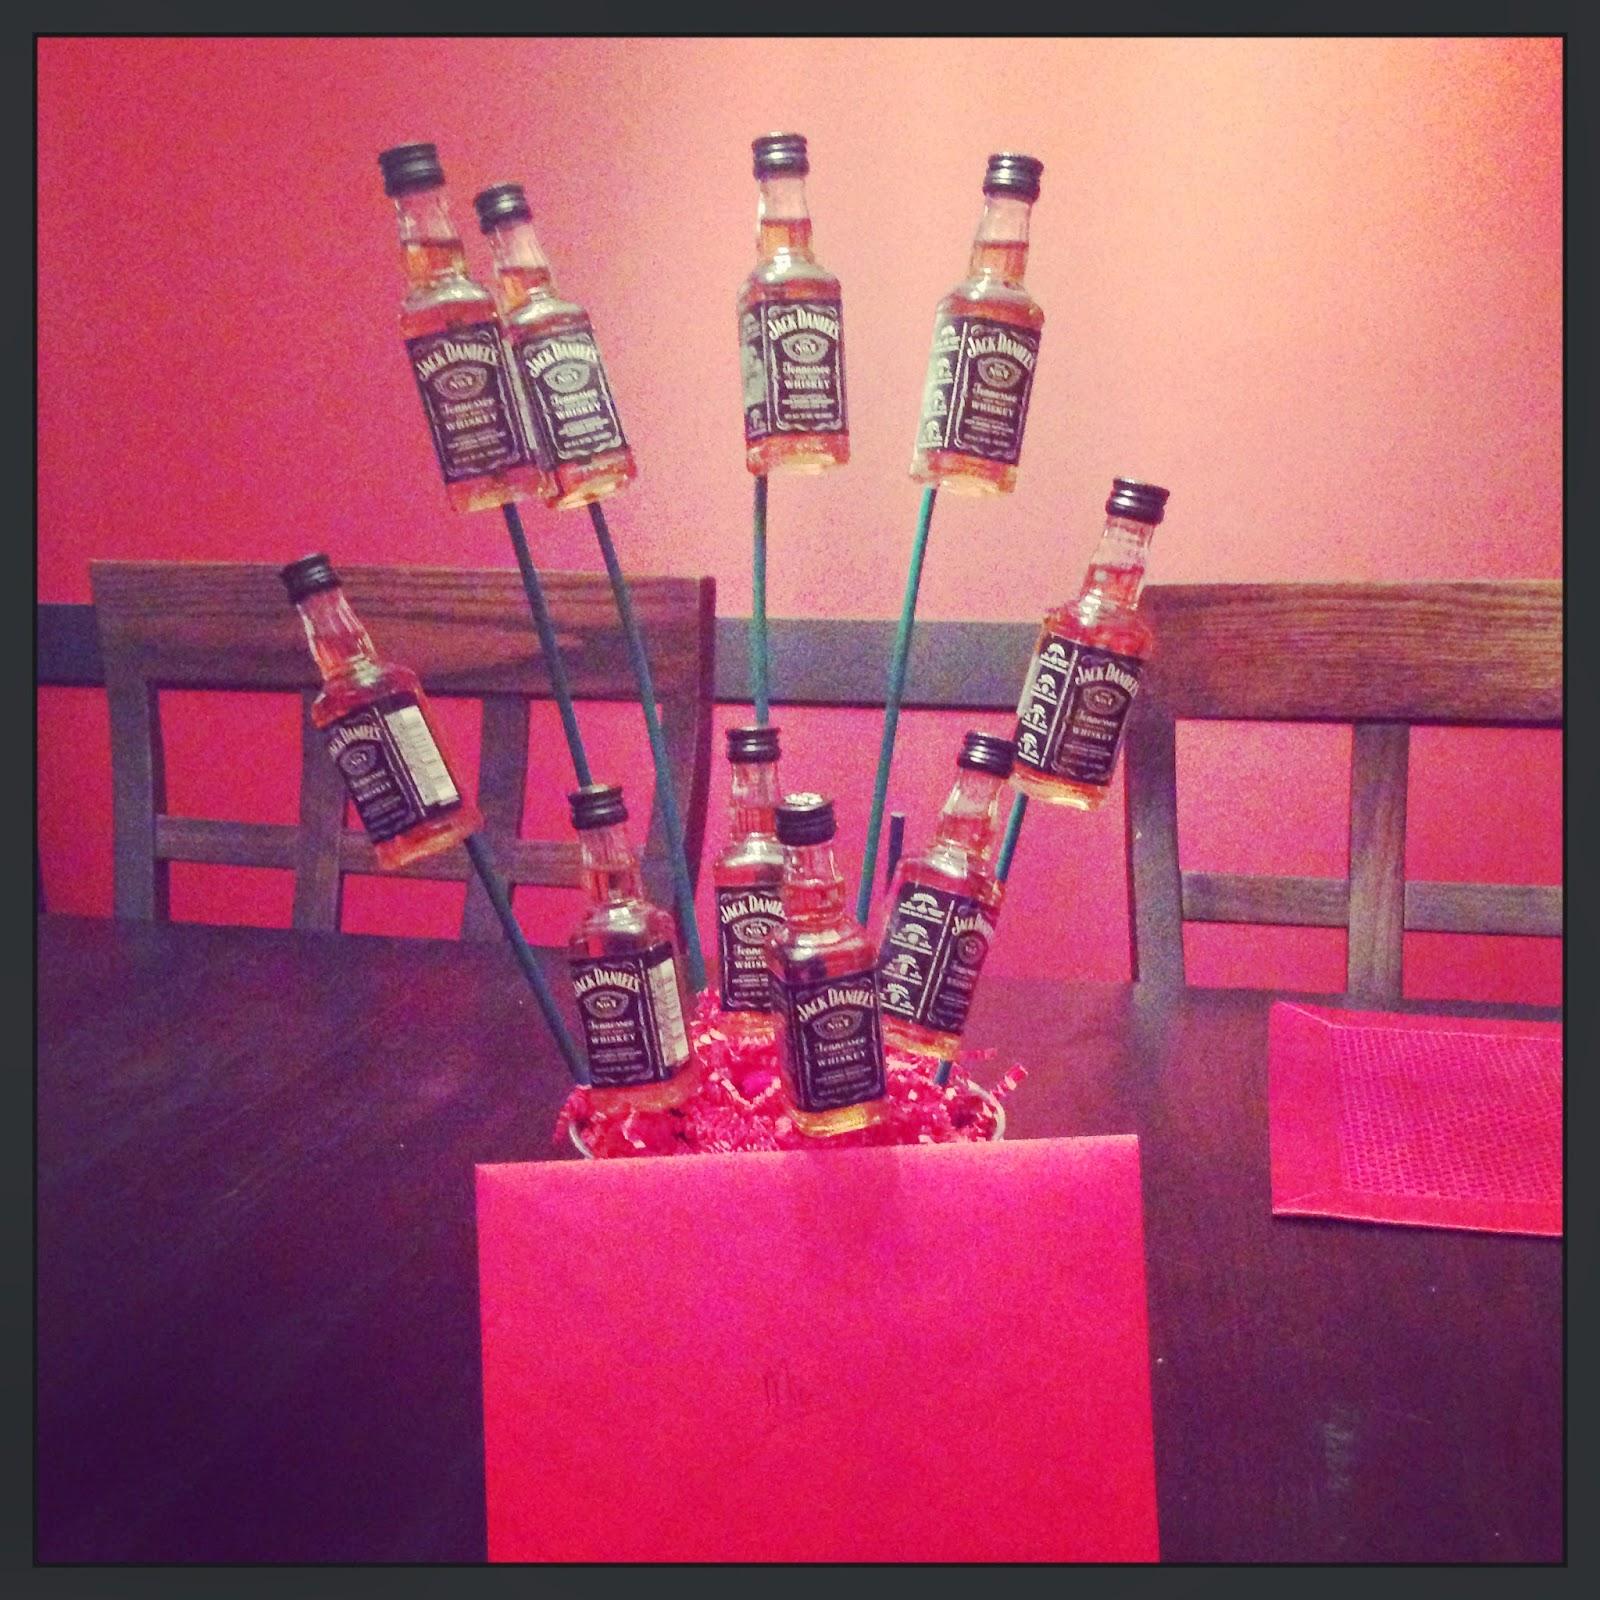 Jack Daniel's, manly valentine gift